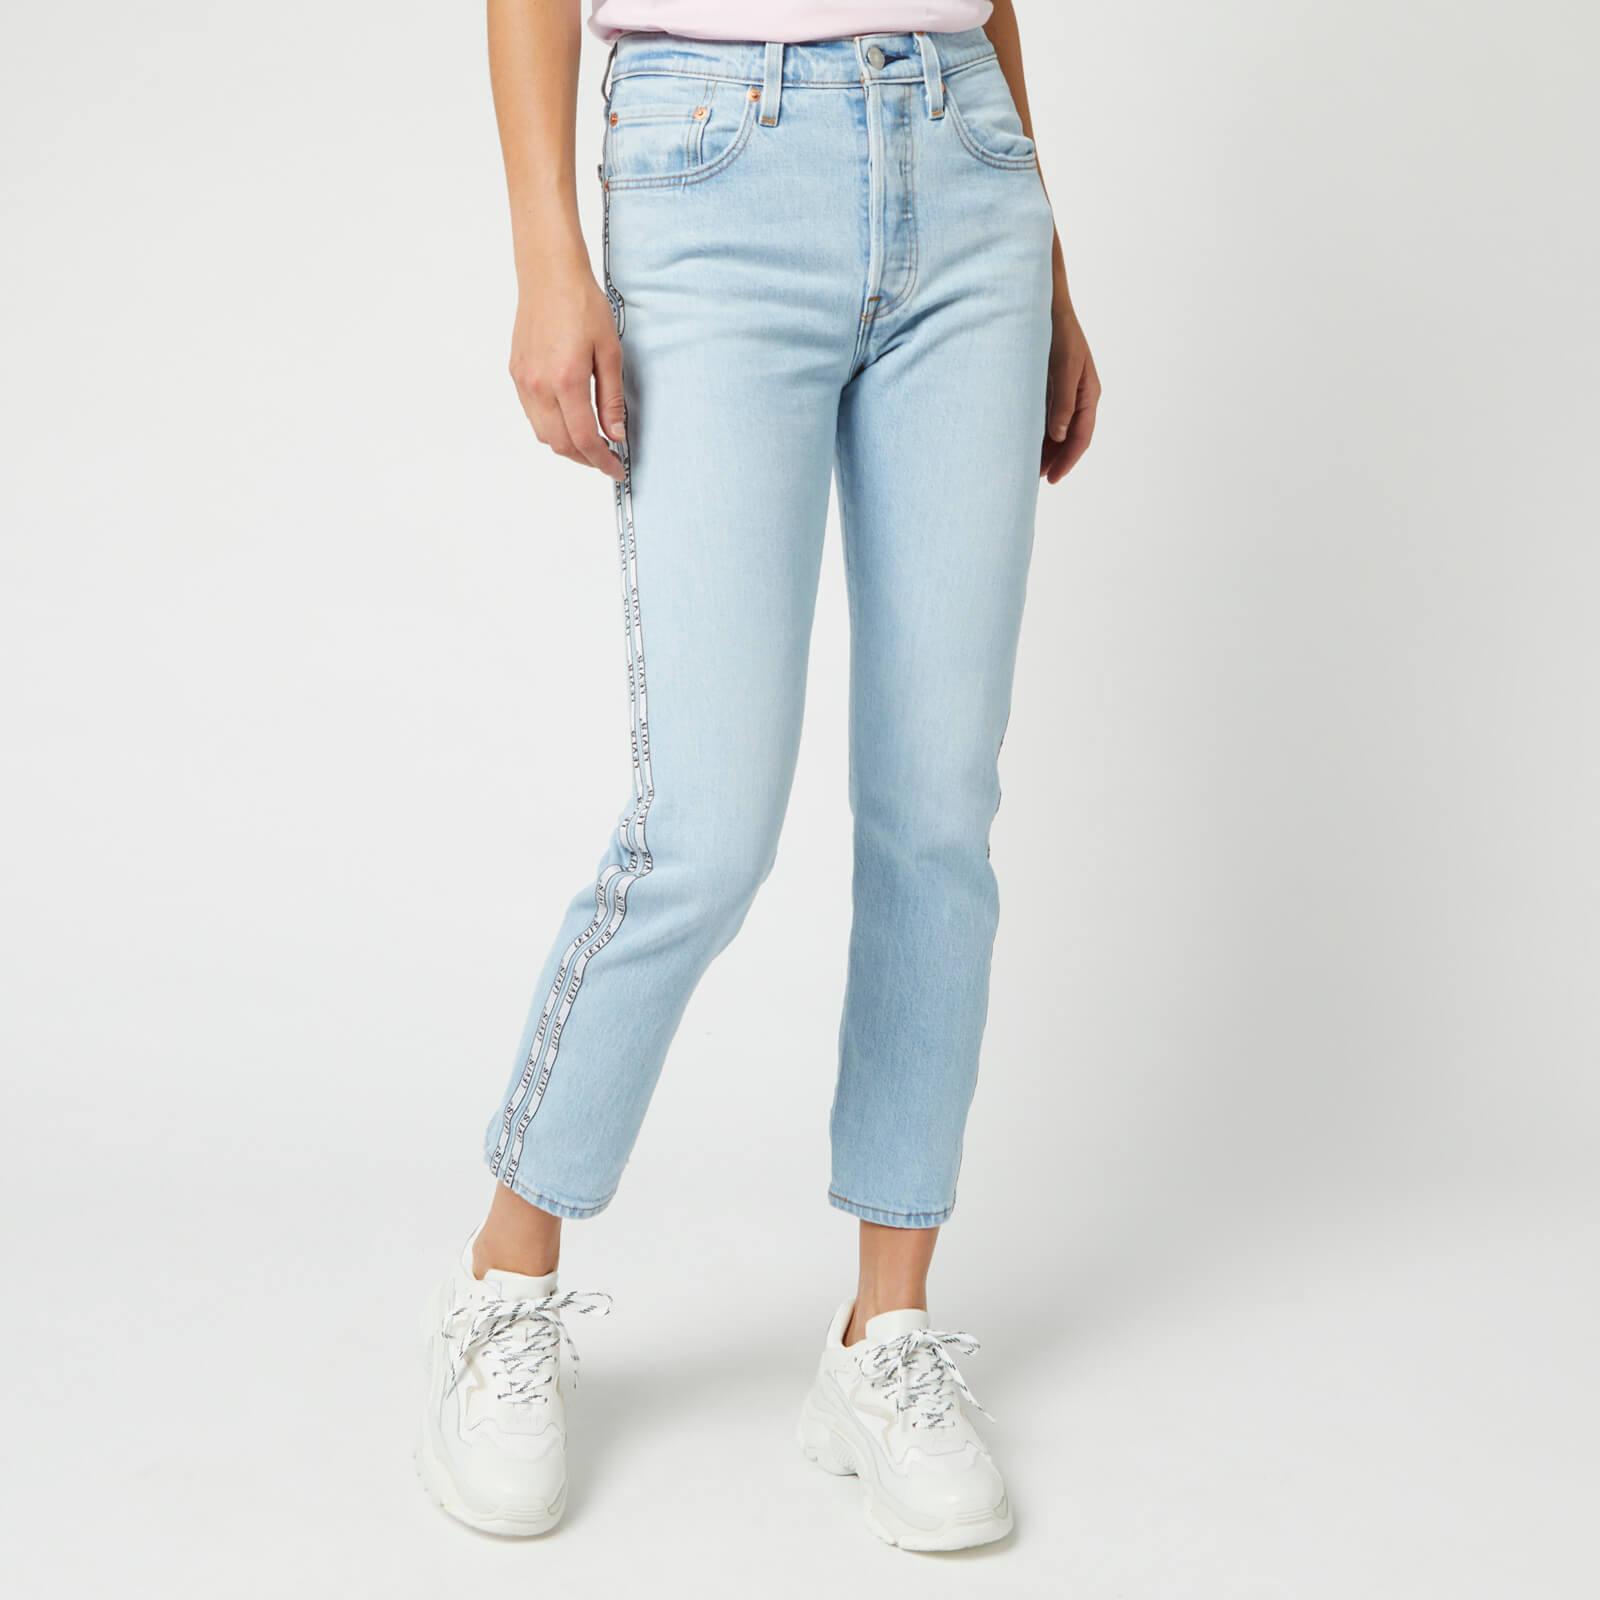 Levi's s 501 Crop Tape Jeans - Light Indigo - W28/L28 - Blue